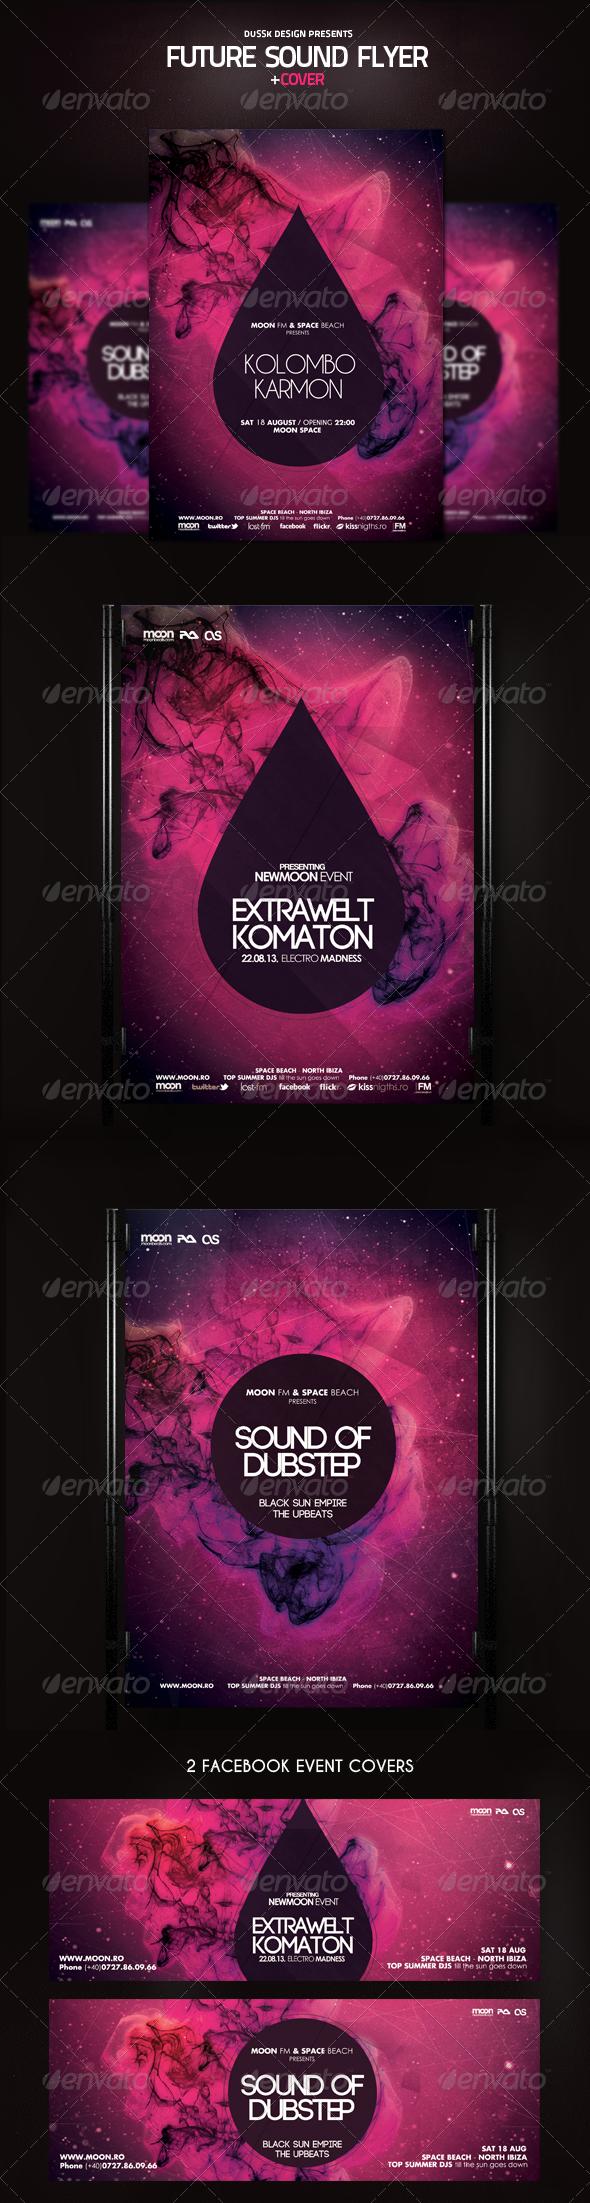 GraphicRiver Future Sound Flyer and Cover 5328097